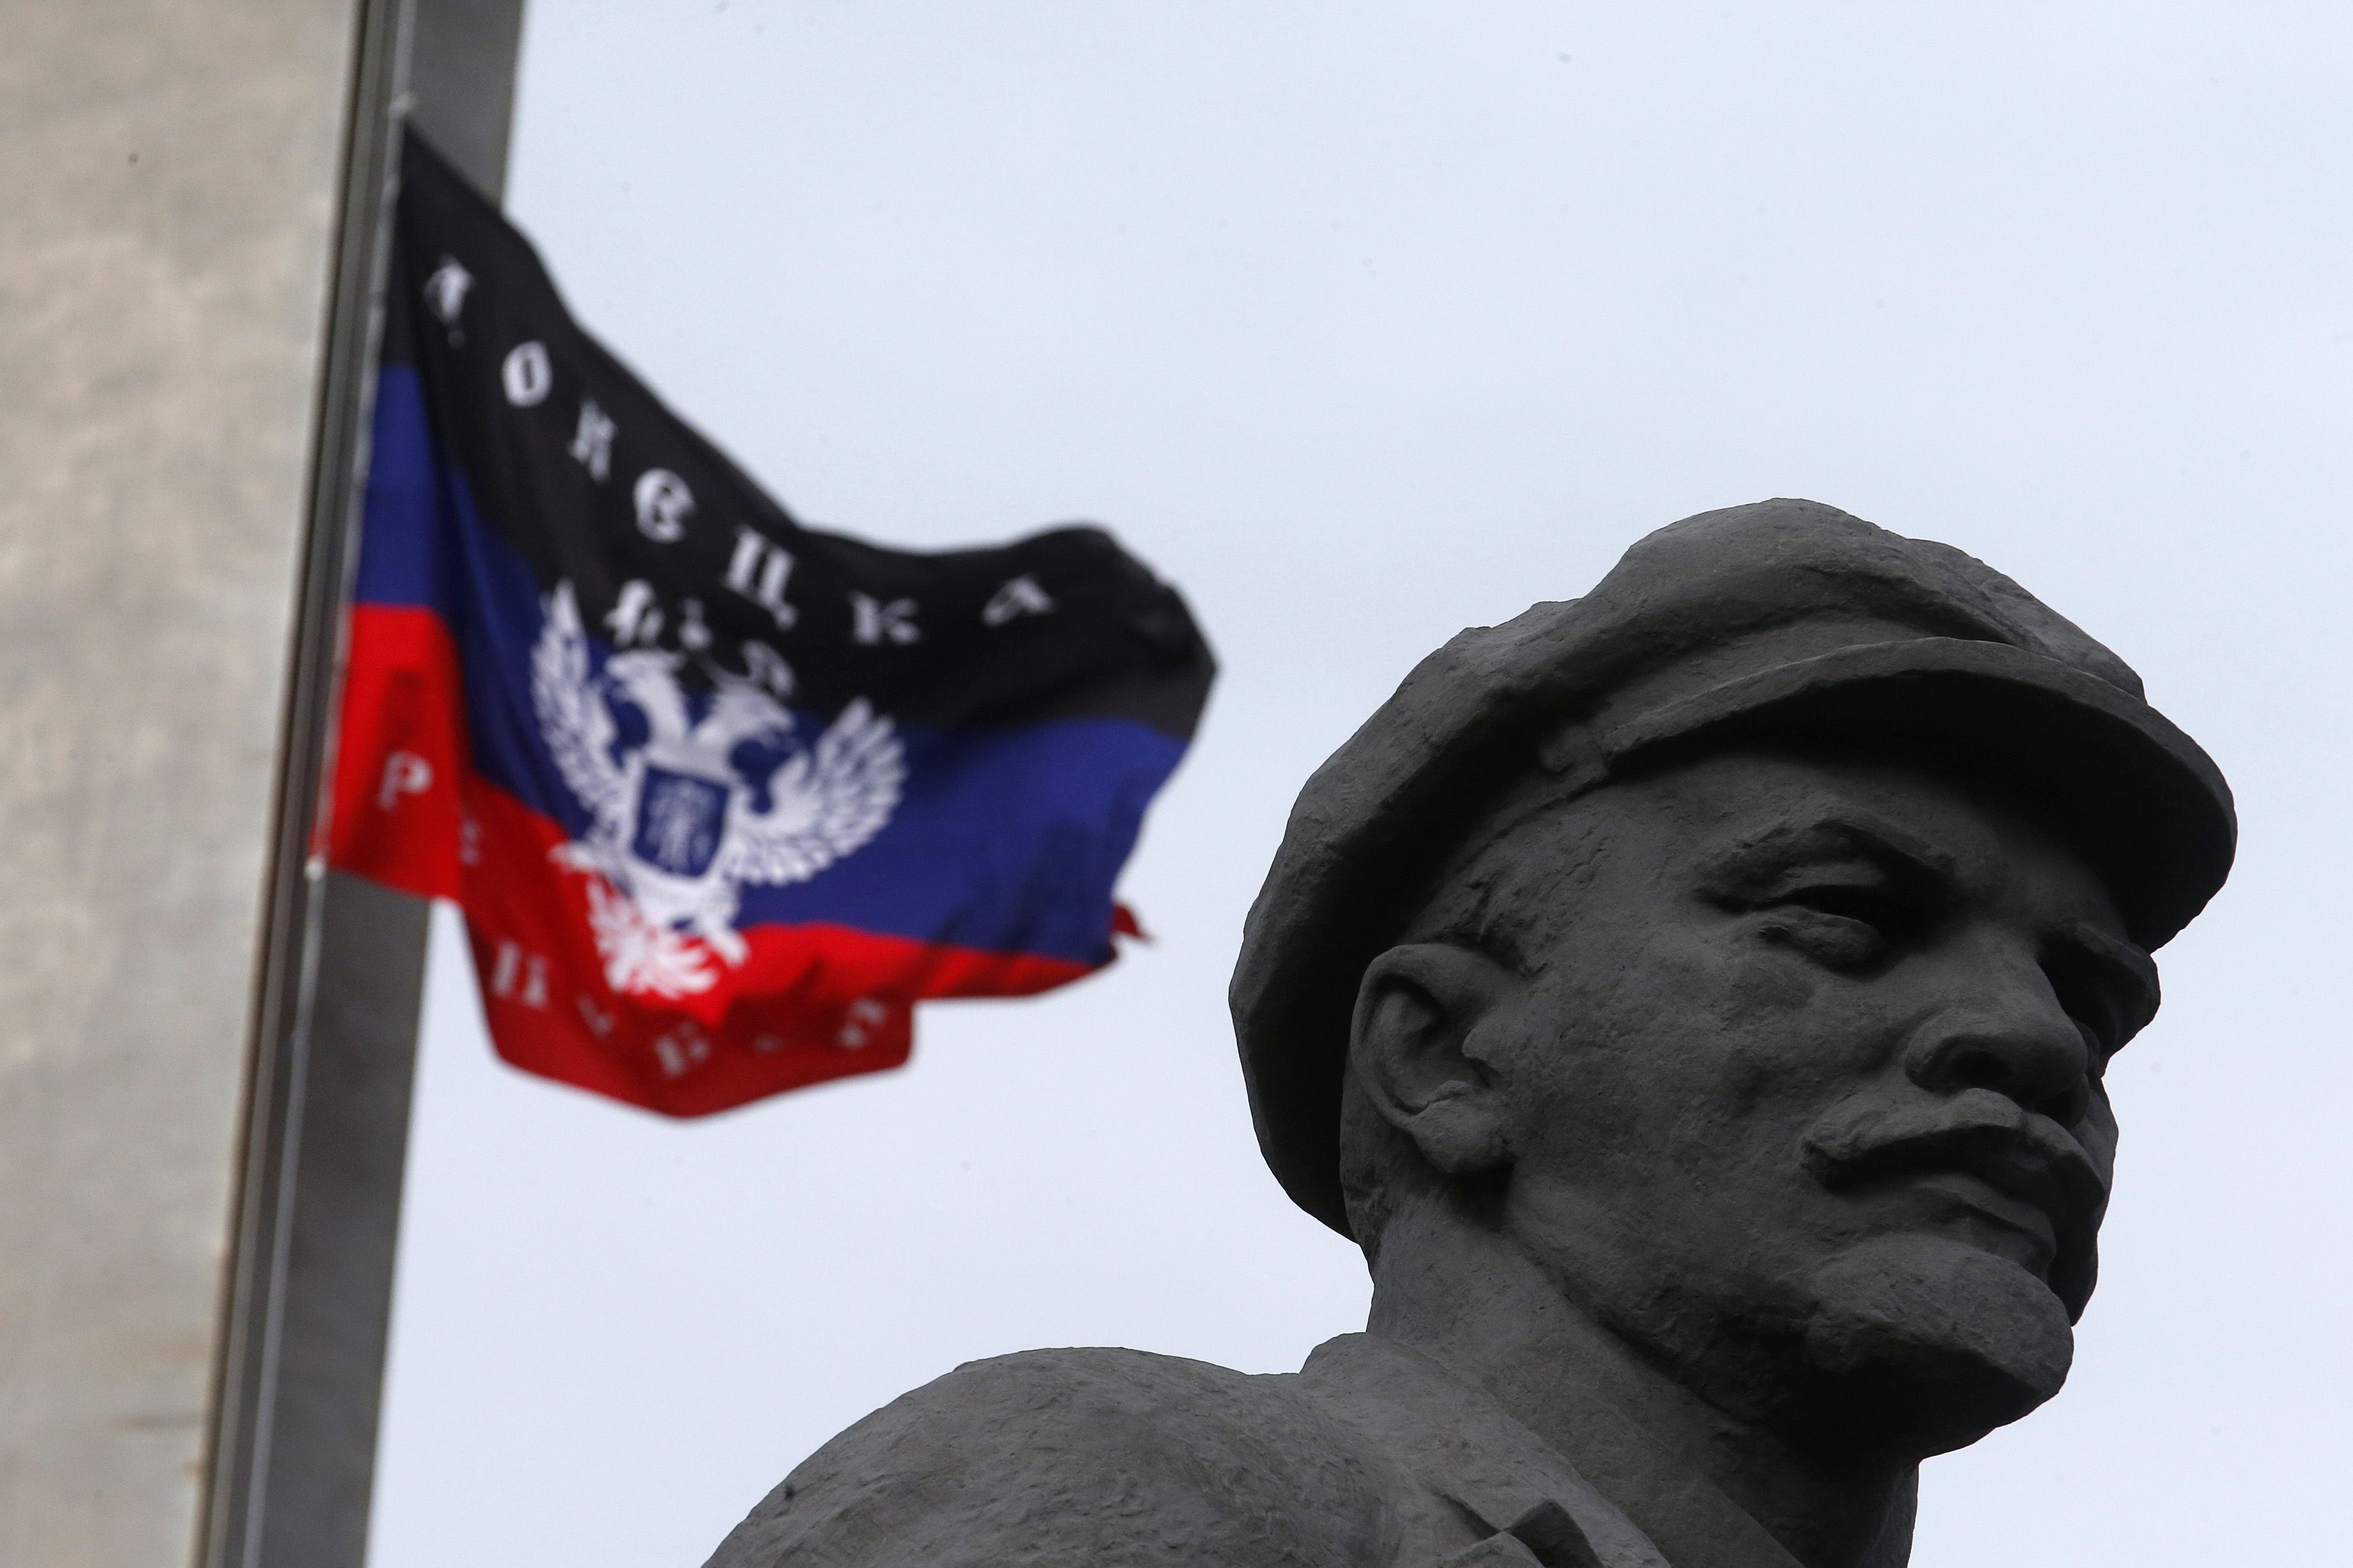 Флаг так называемой ДНР, иллюстрация